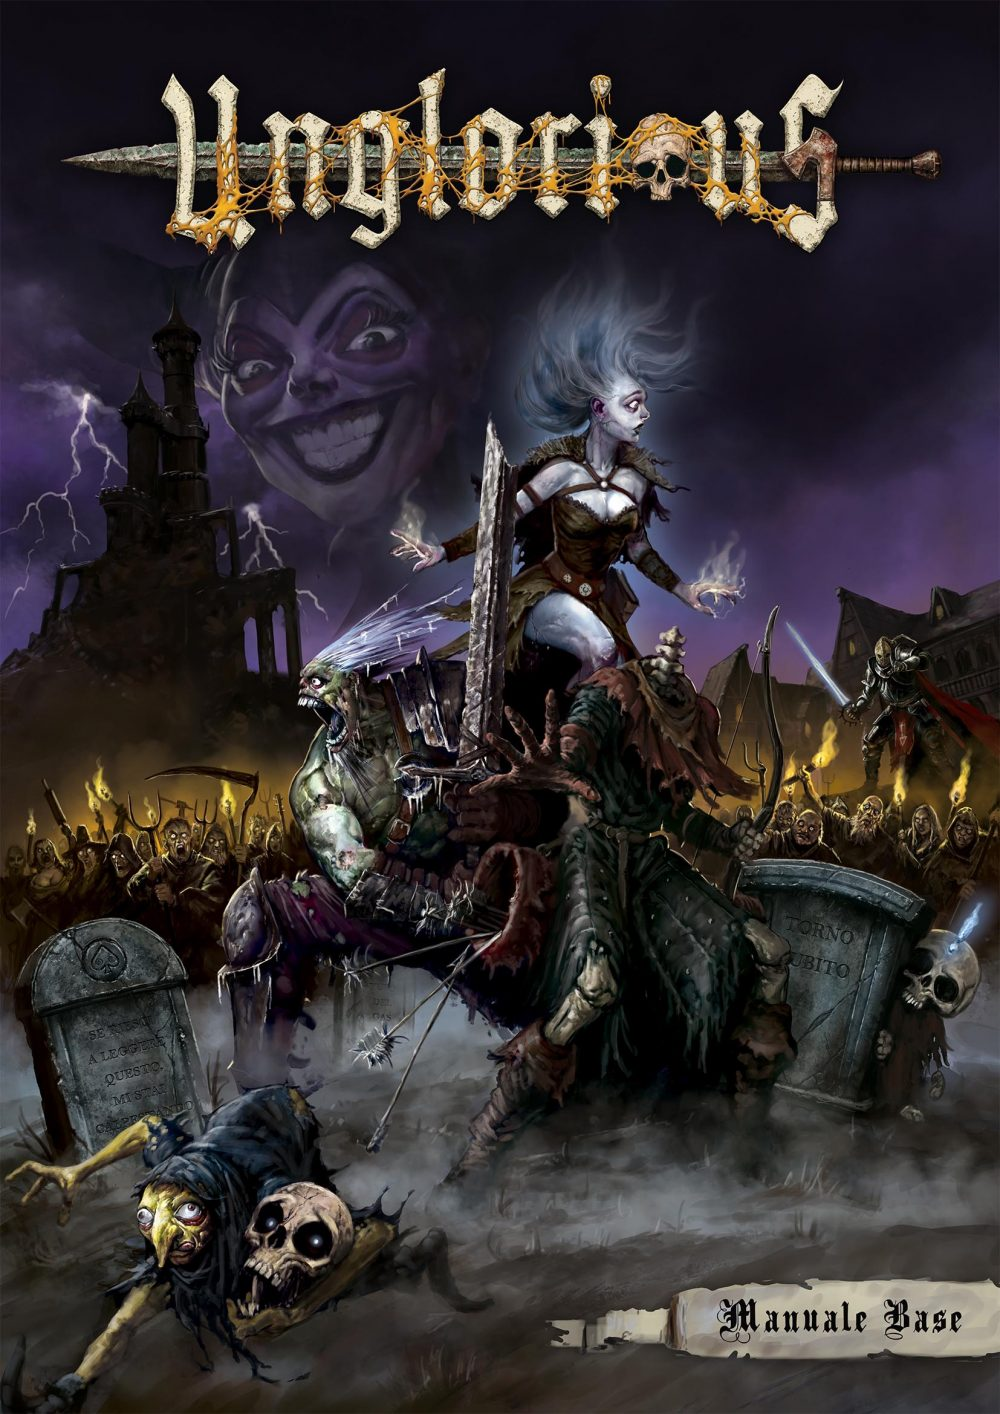 Aces Games - Unglorious GdR necro-fantasy, cover del manuale base